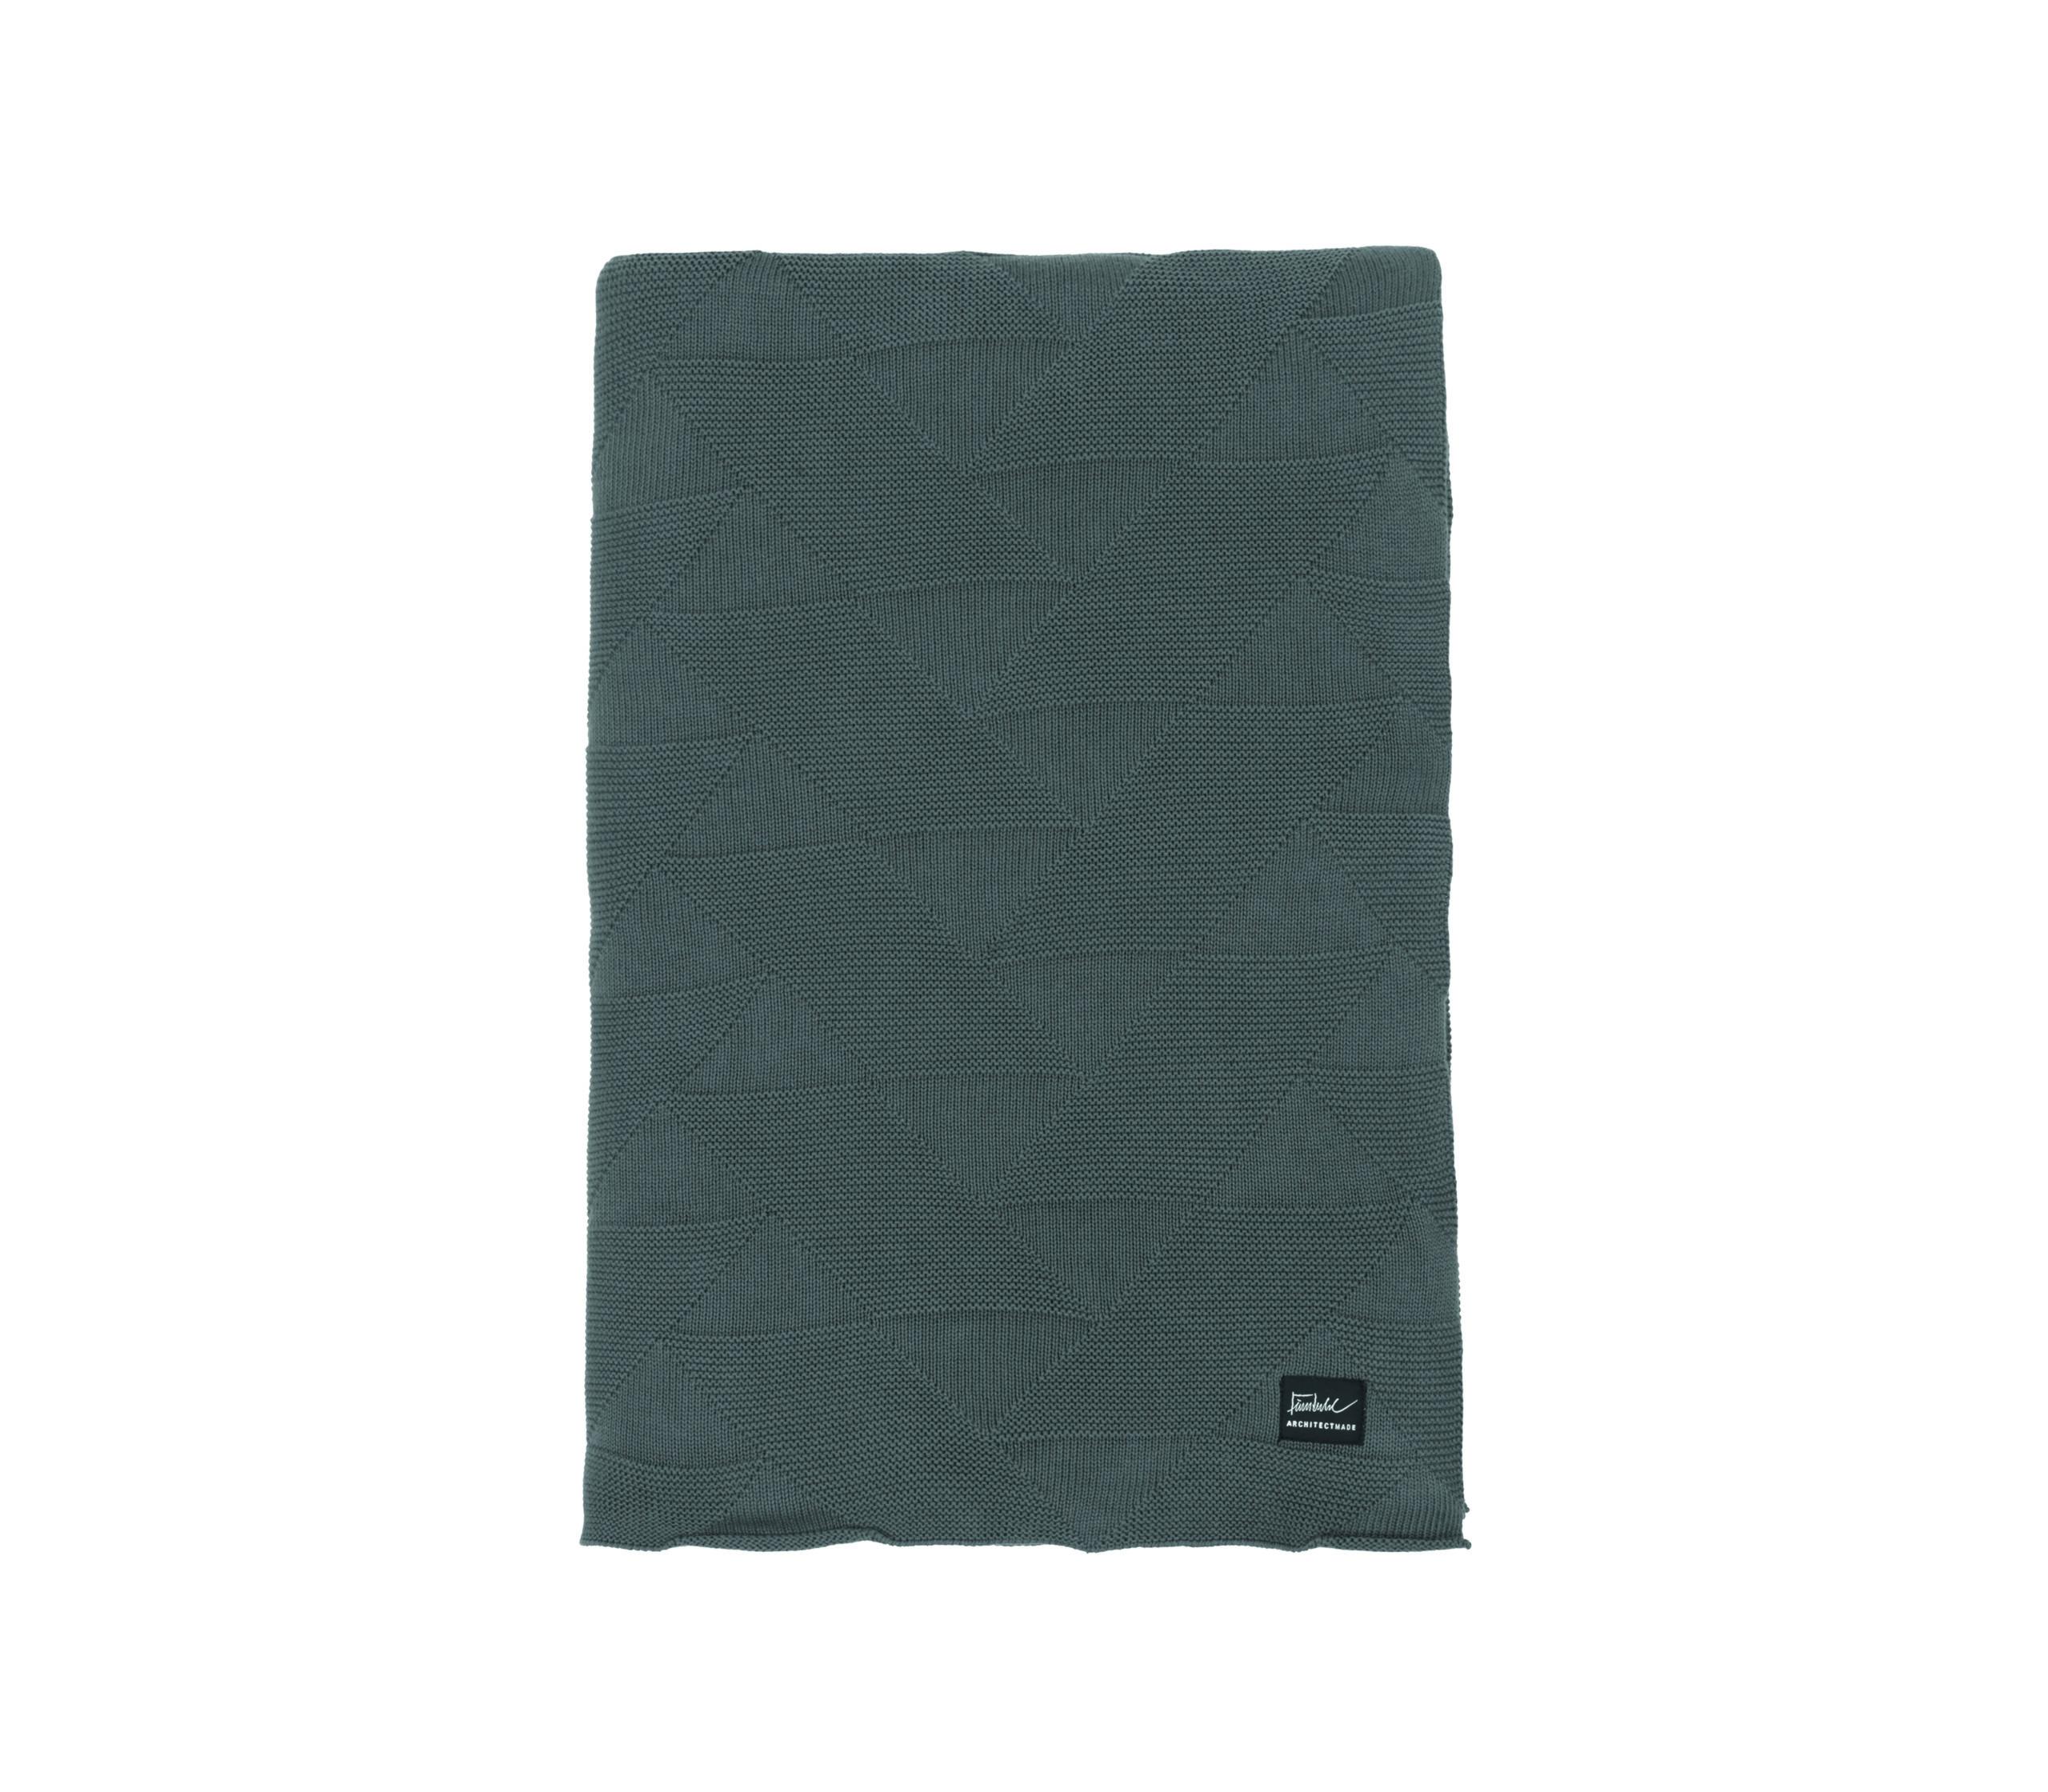 Architectmade-FJ-Pattern-Blanket-Grey-Organic-Cotton-Finn-Juhl